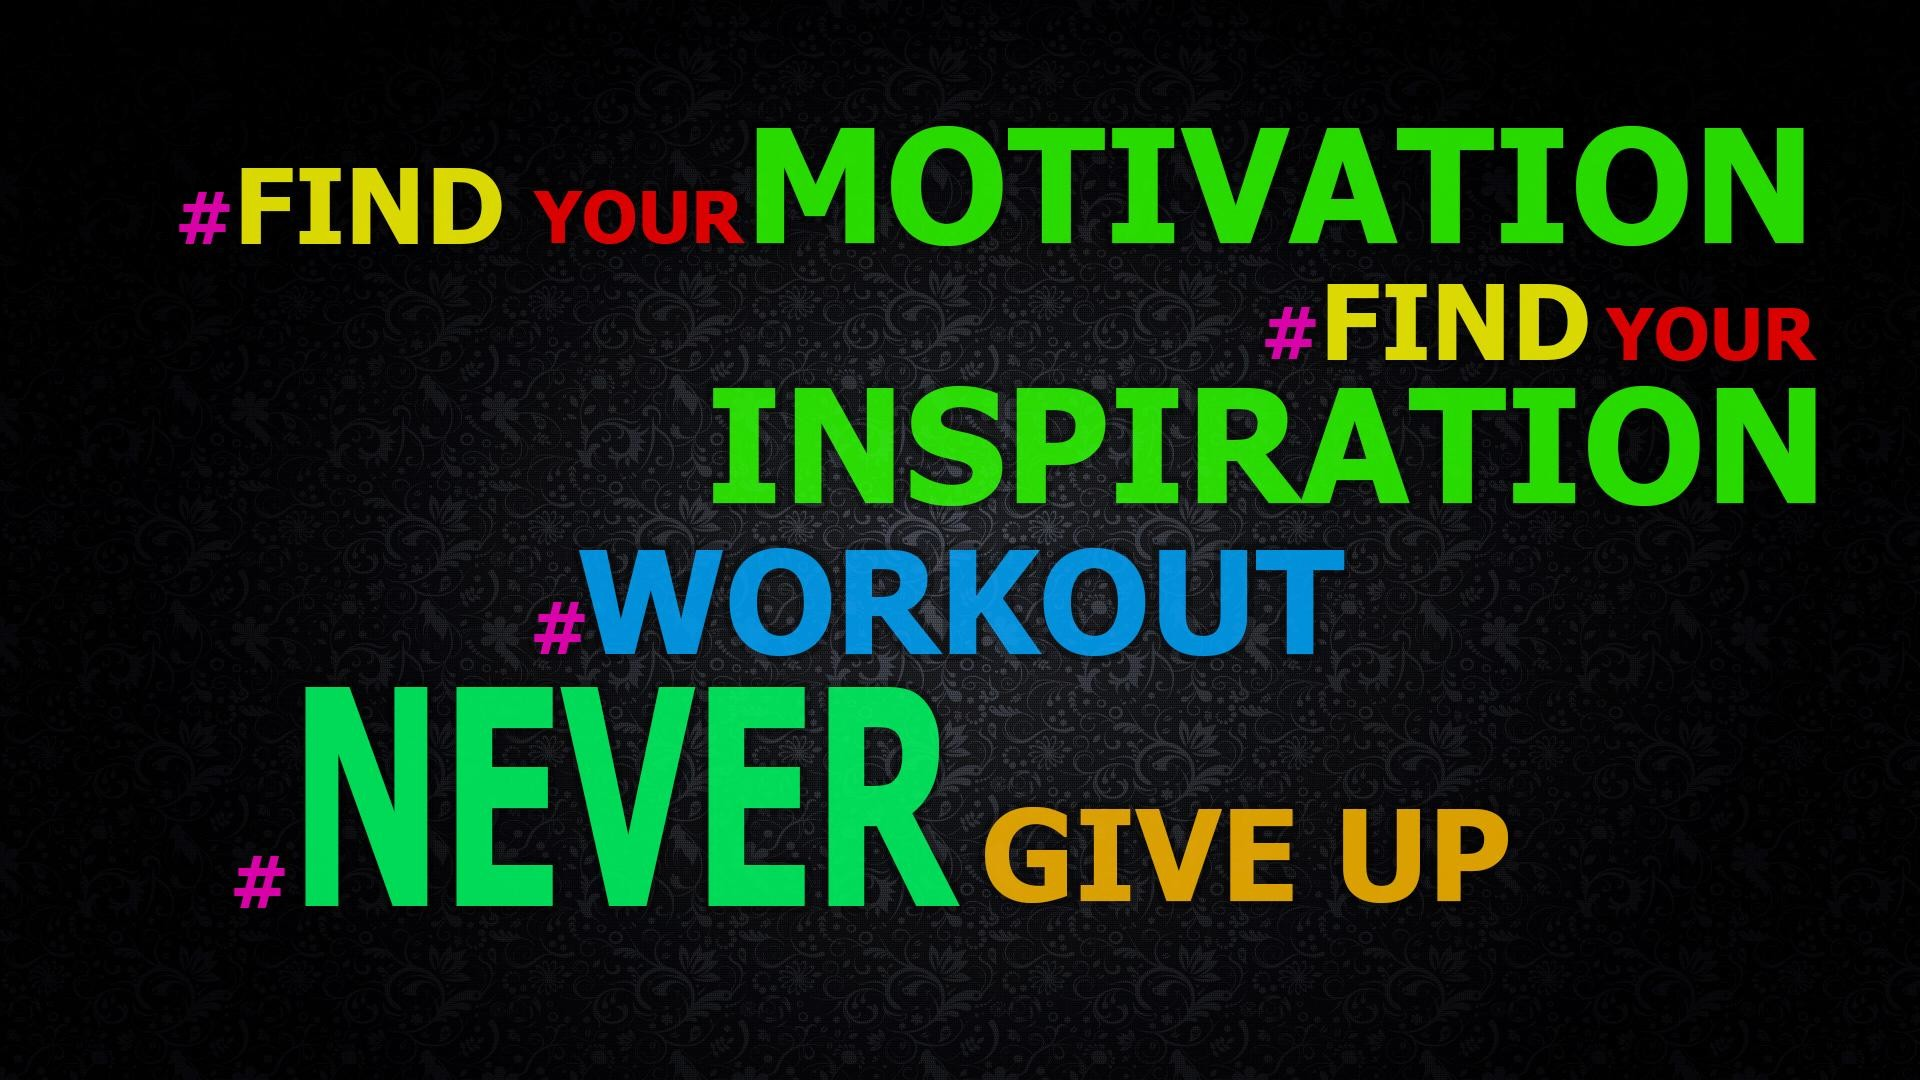 Workout-motivation-wallpaper-backgrounds-download